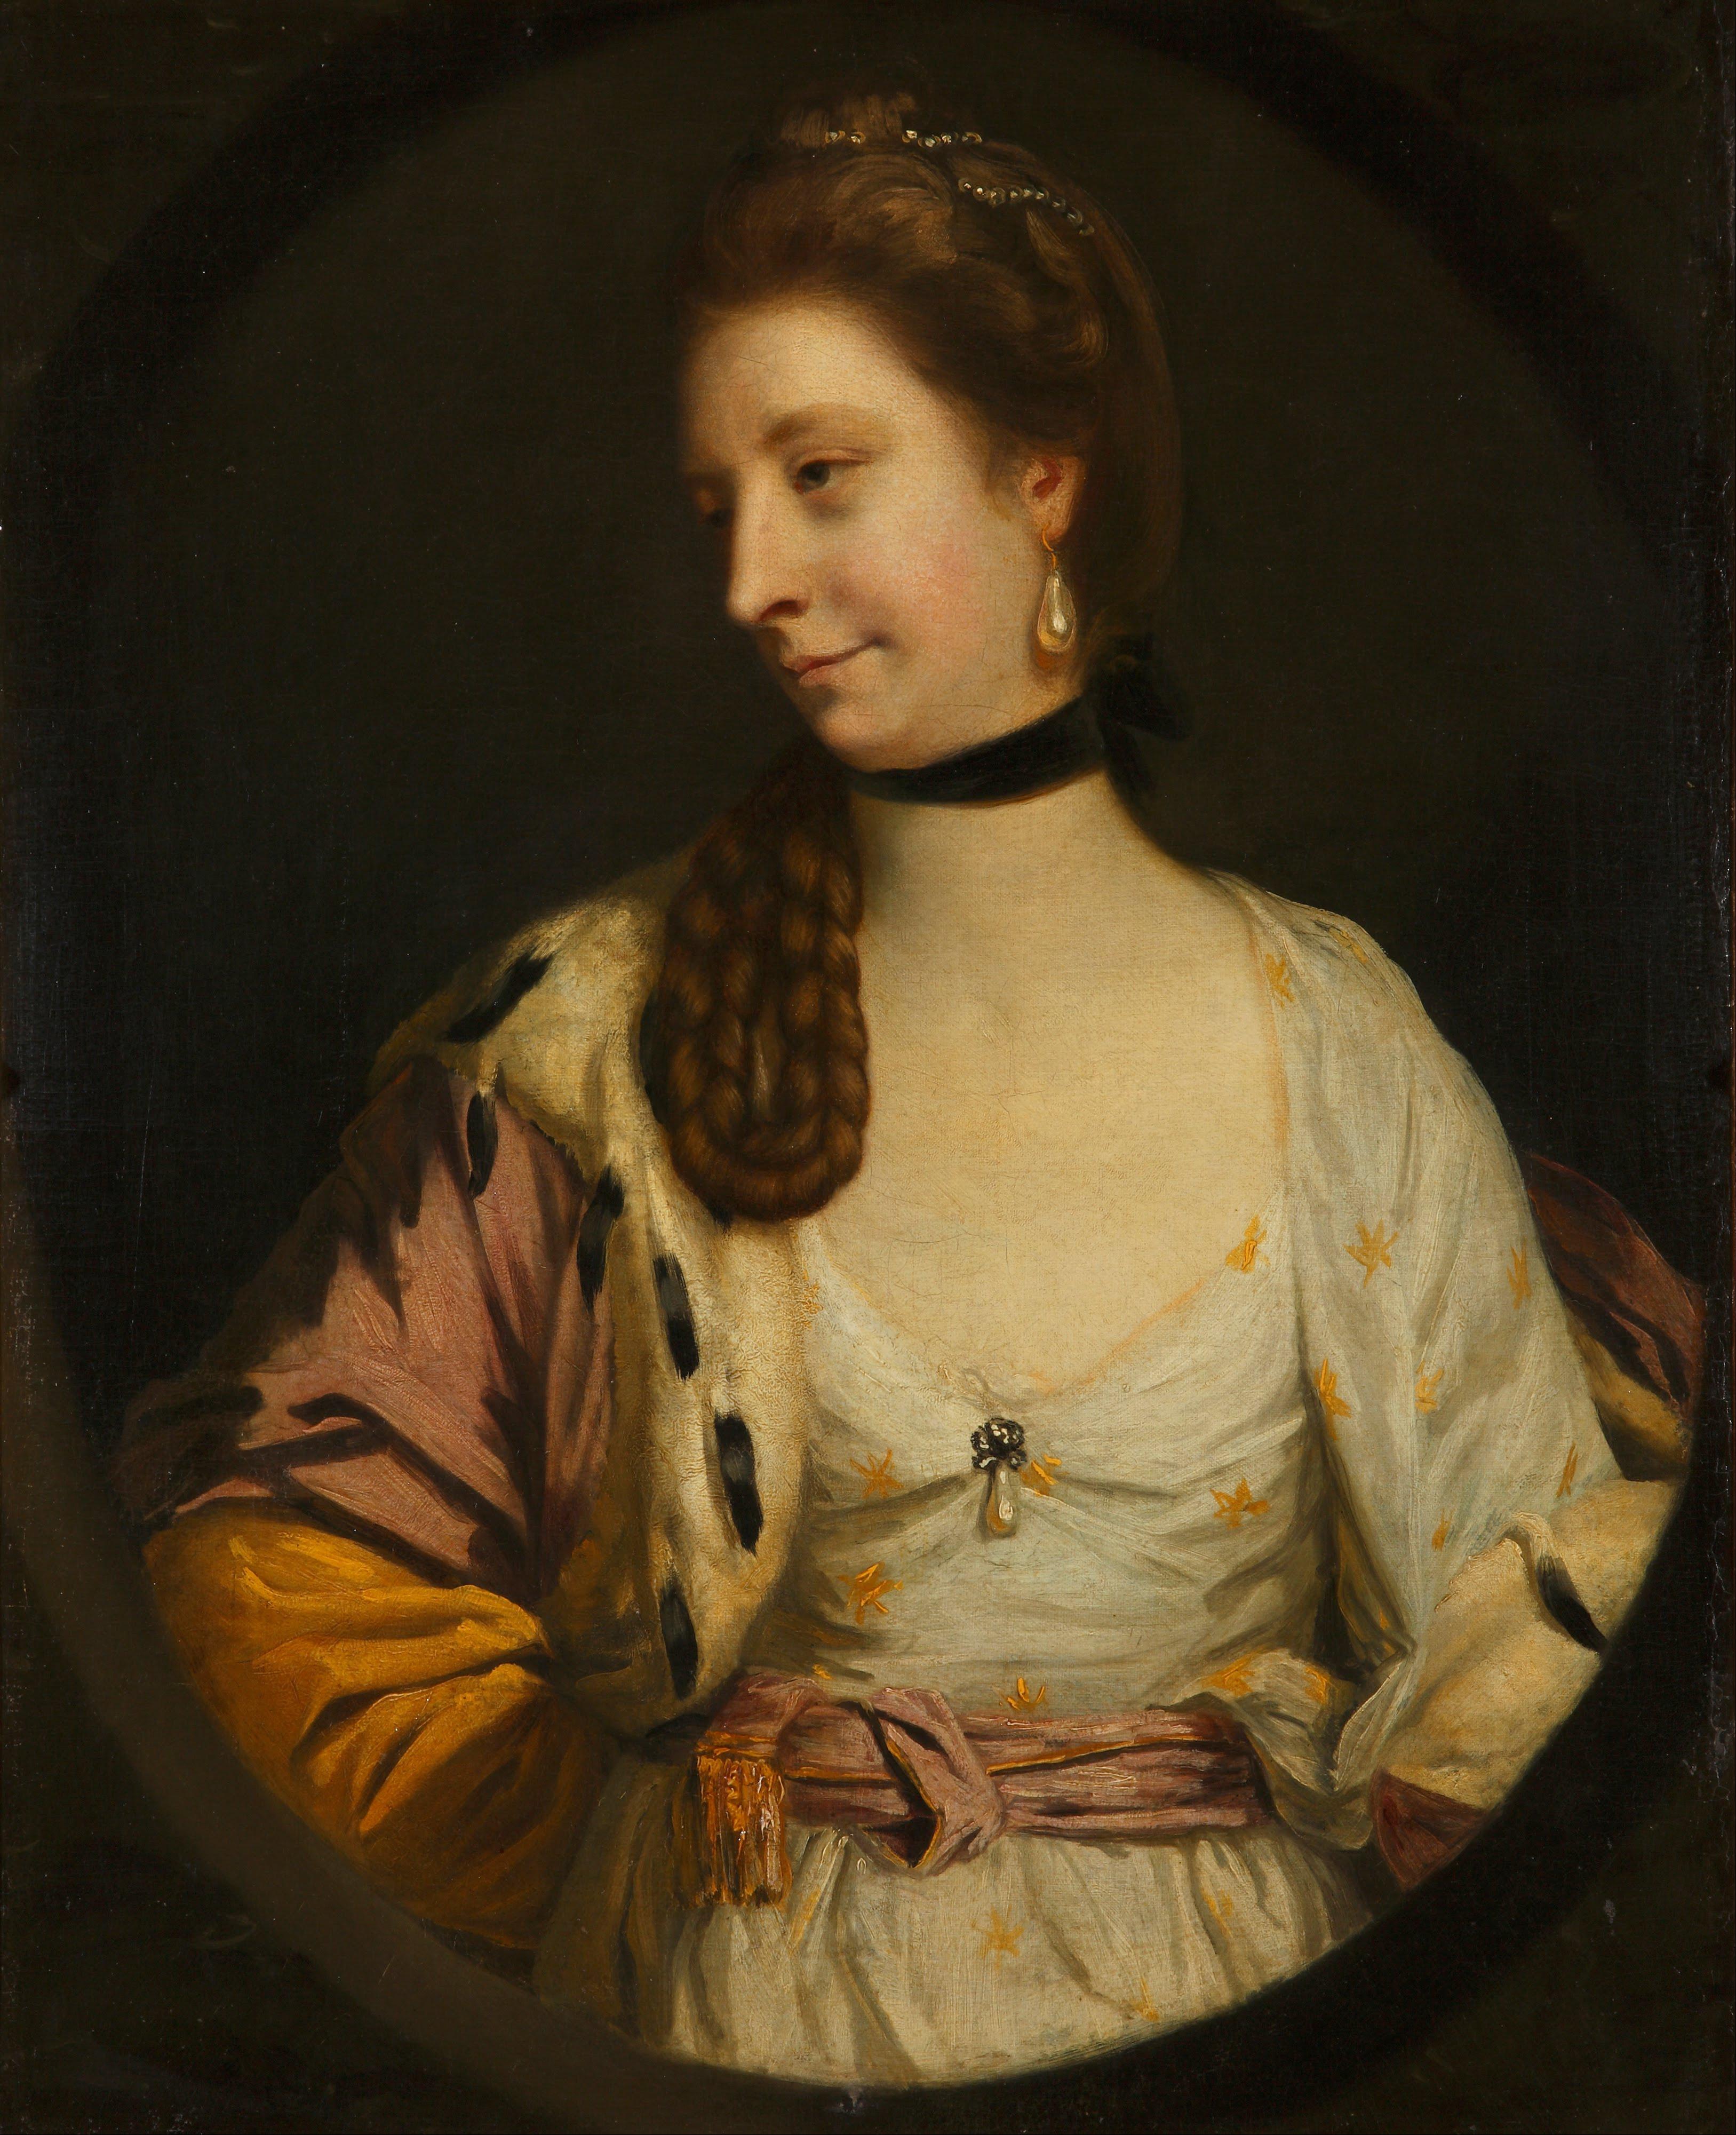 Joshua Reynolds Paintings For Sale